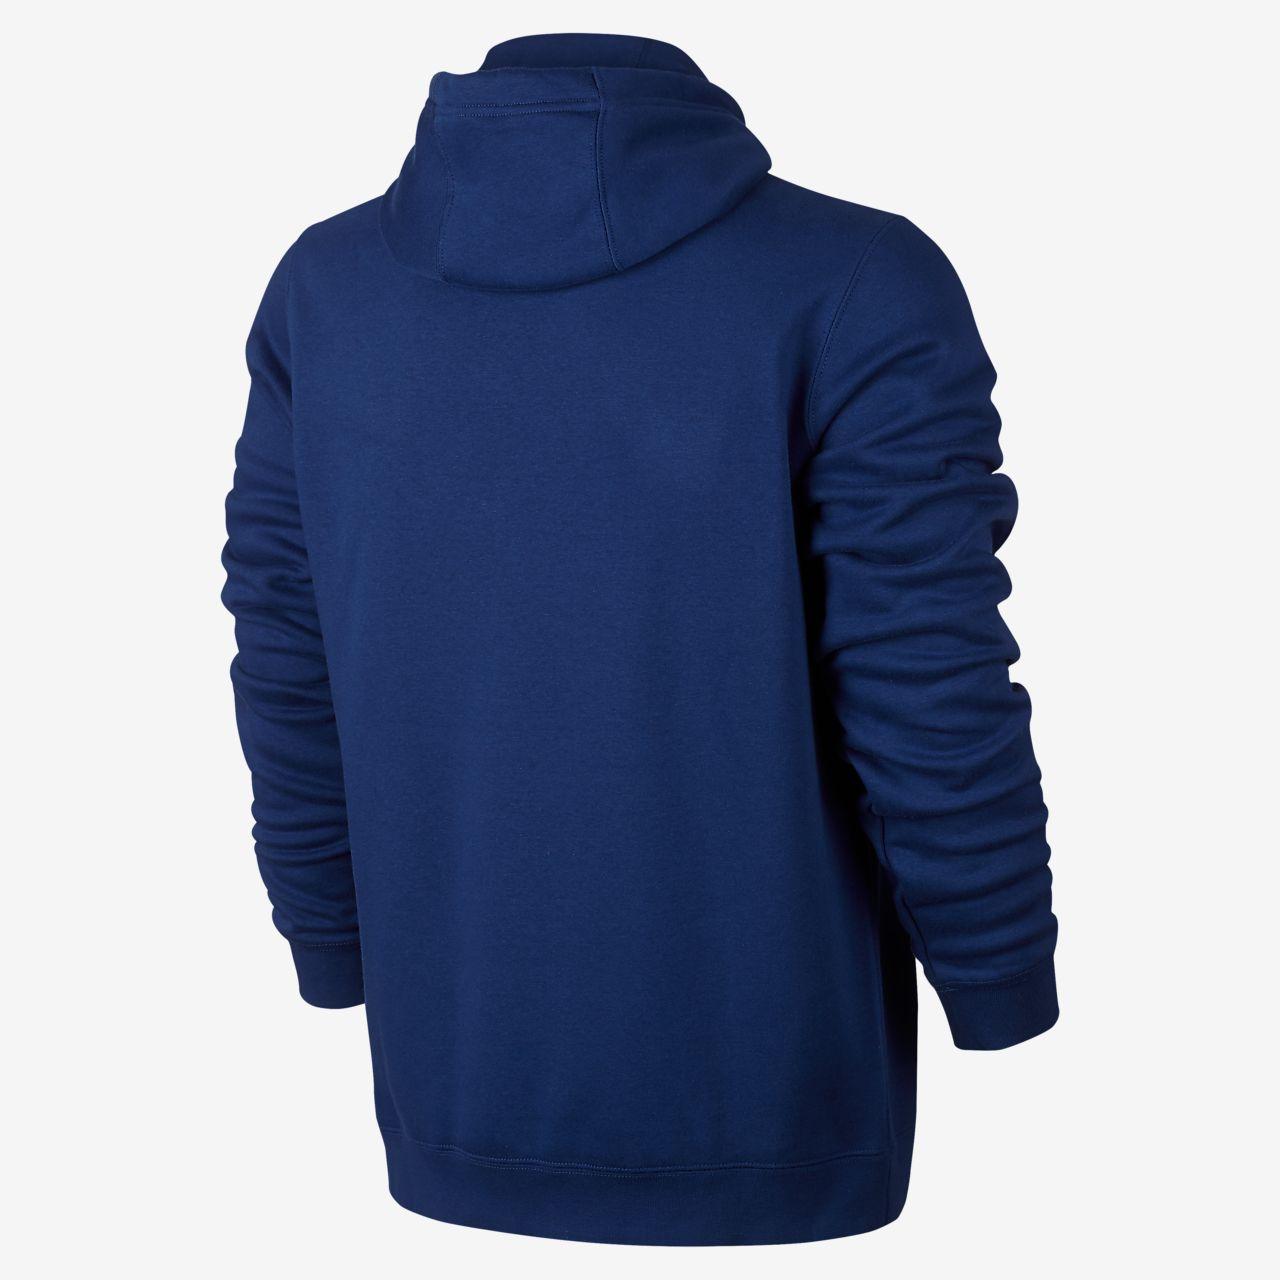 96dee35edc36c barcelona soccer sweater on sale   OFF56% Discounts